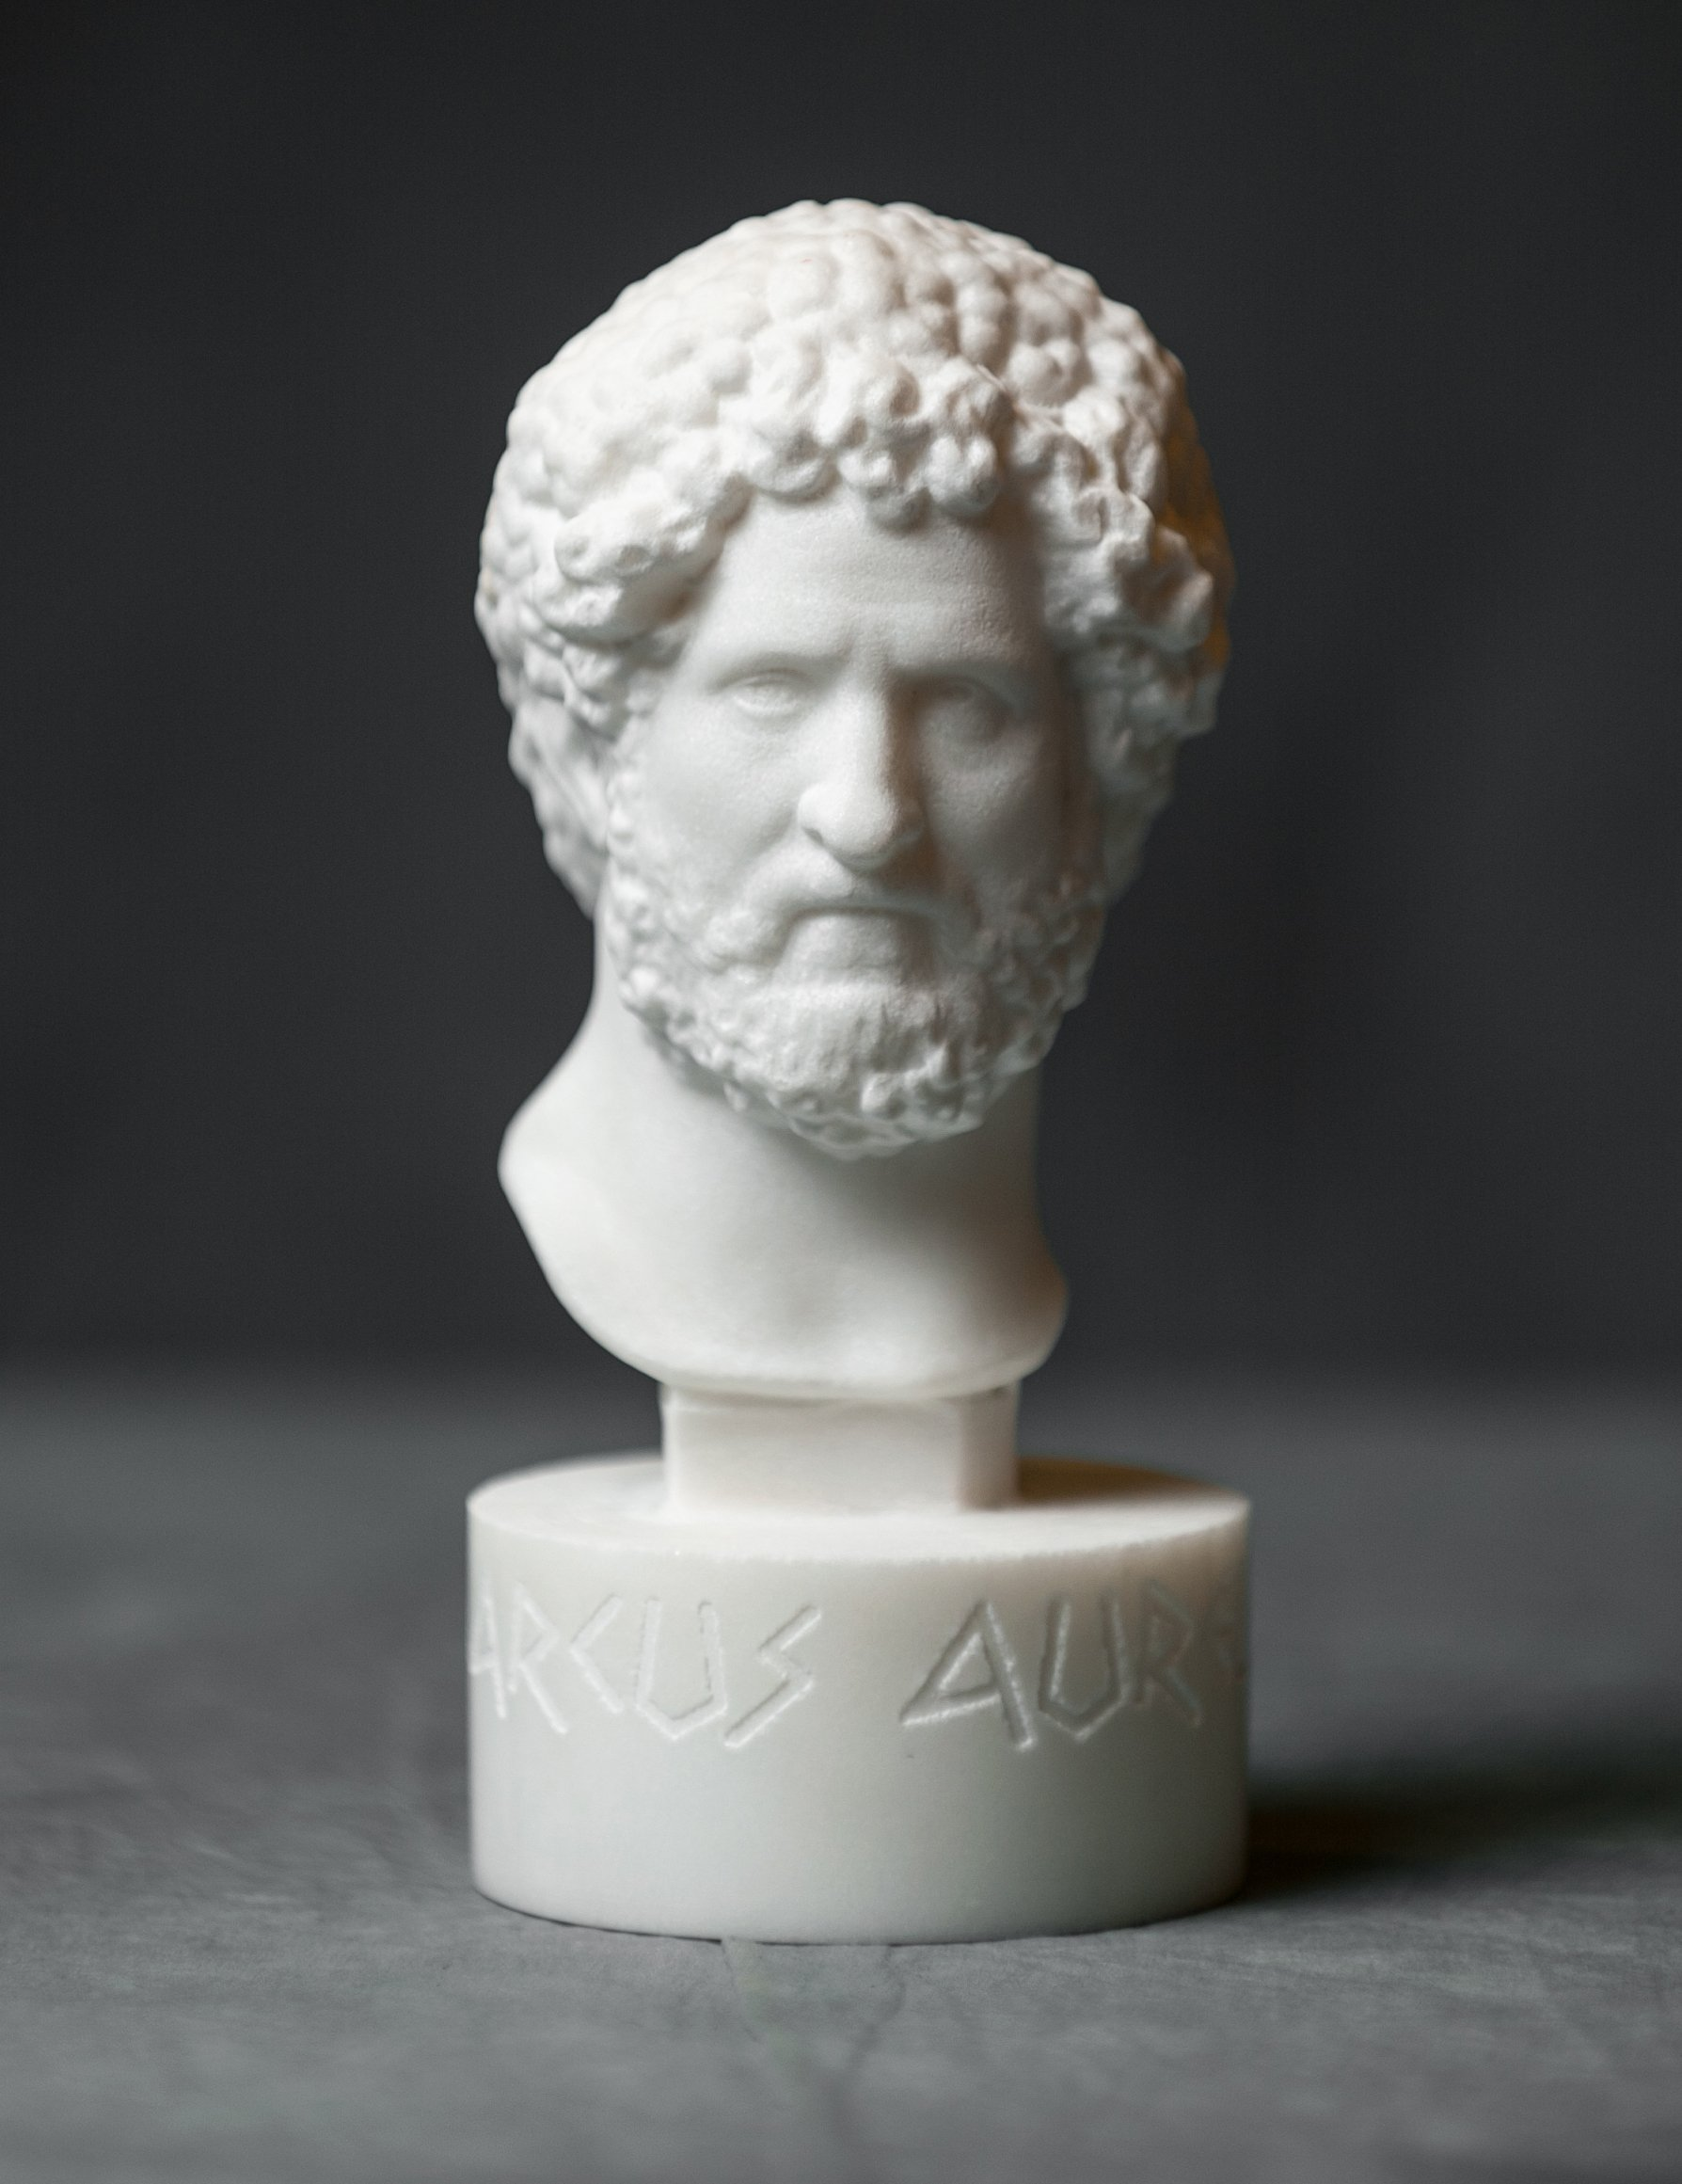 Marble Bust of Marcus Aurelius Carved Marble Statue Figurine Artist Sculpture by Greek Marble Art